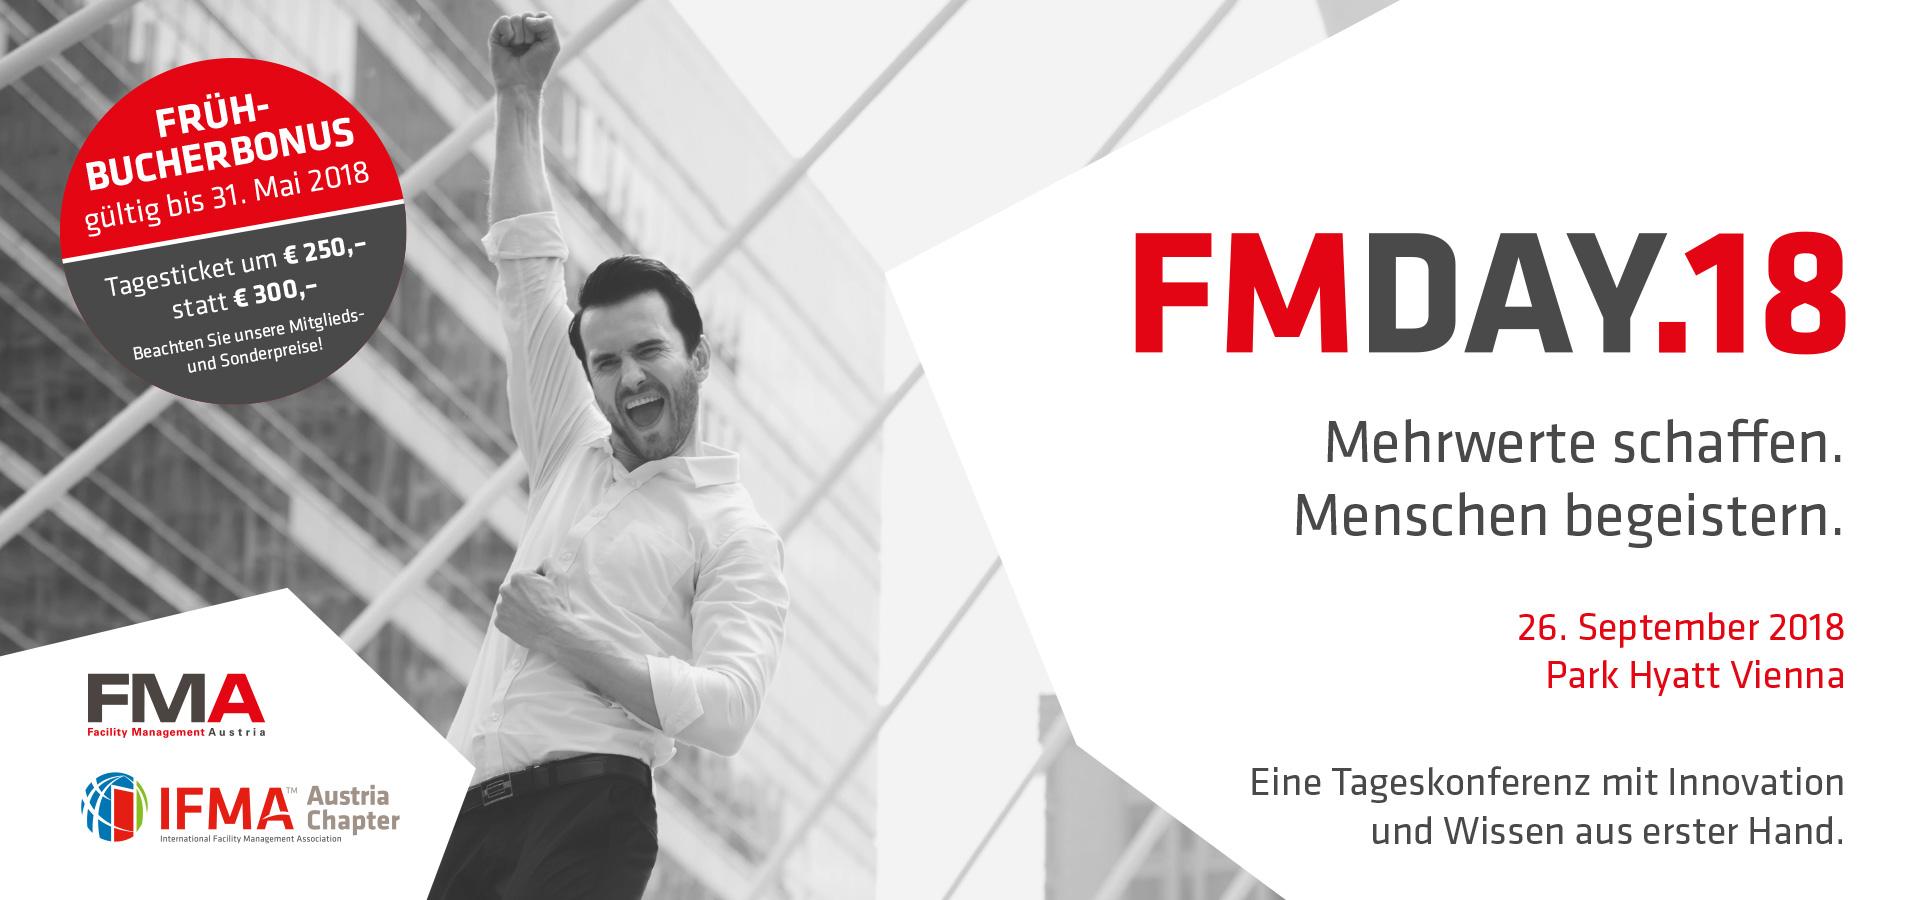 FM-Day - Save the Date 26. September 2018 Park Hyatt Vienna